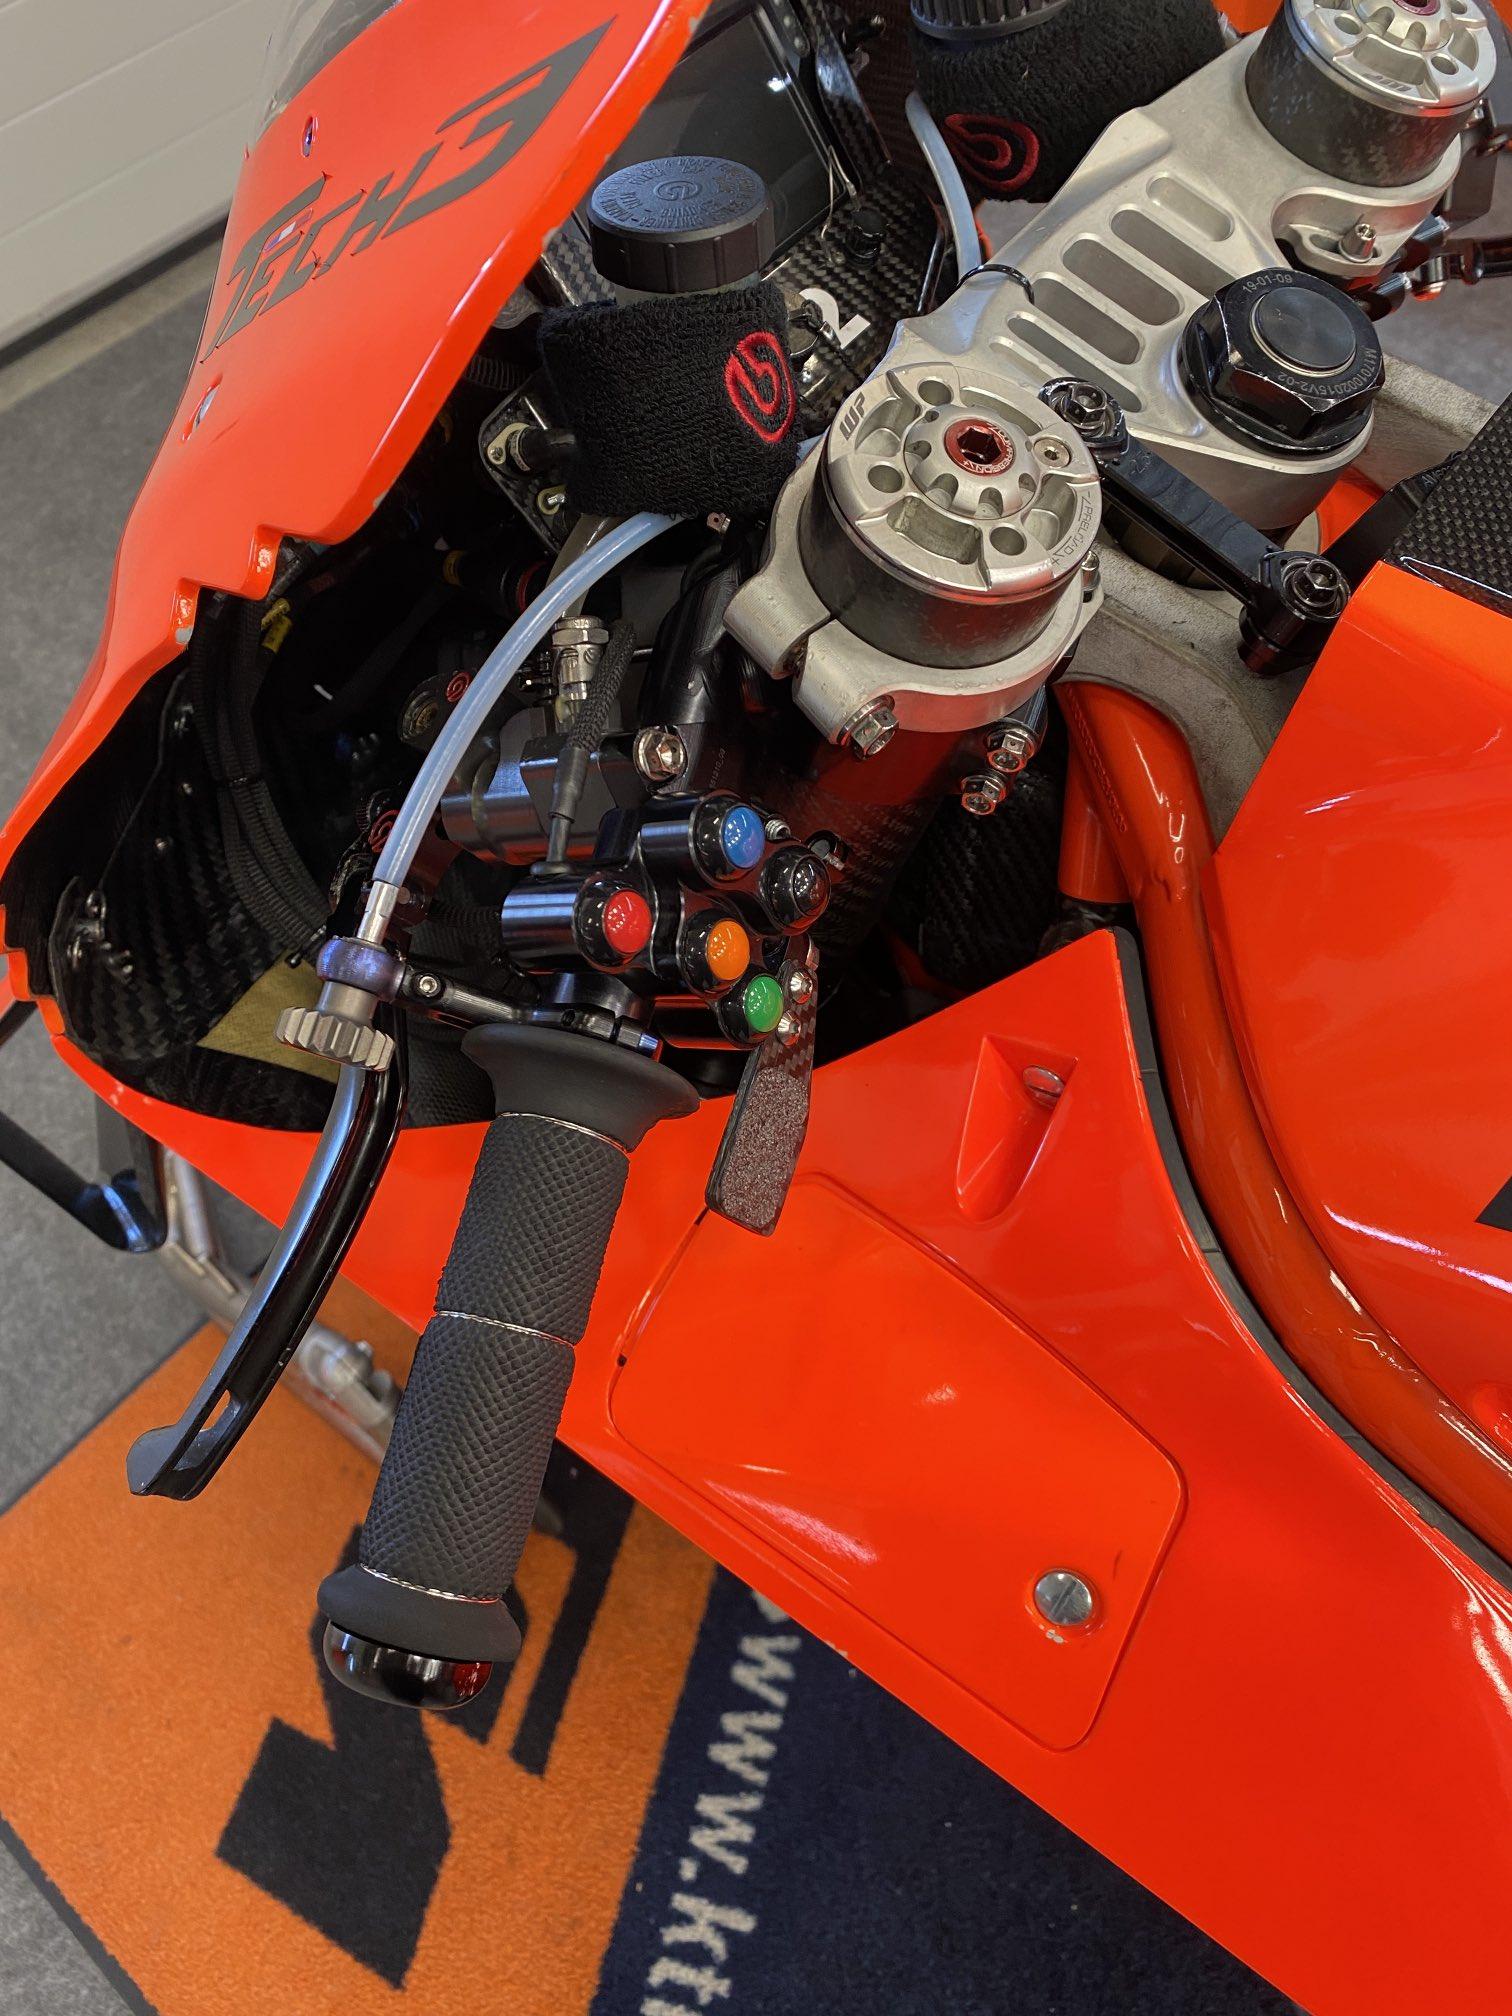 Moto GP 2021 - Page 16 E12pq8QXoAc8GJz?format=jpg&name=large